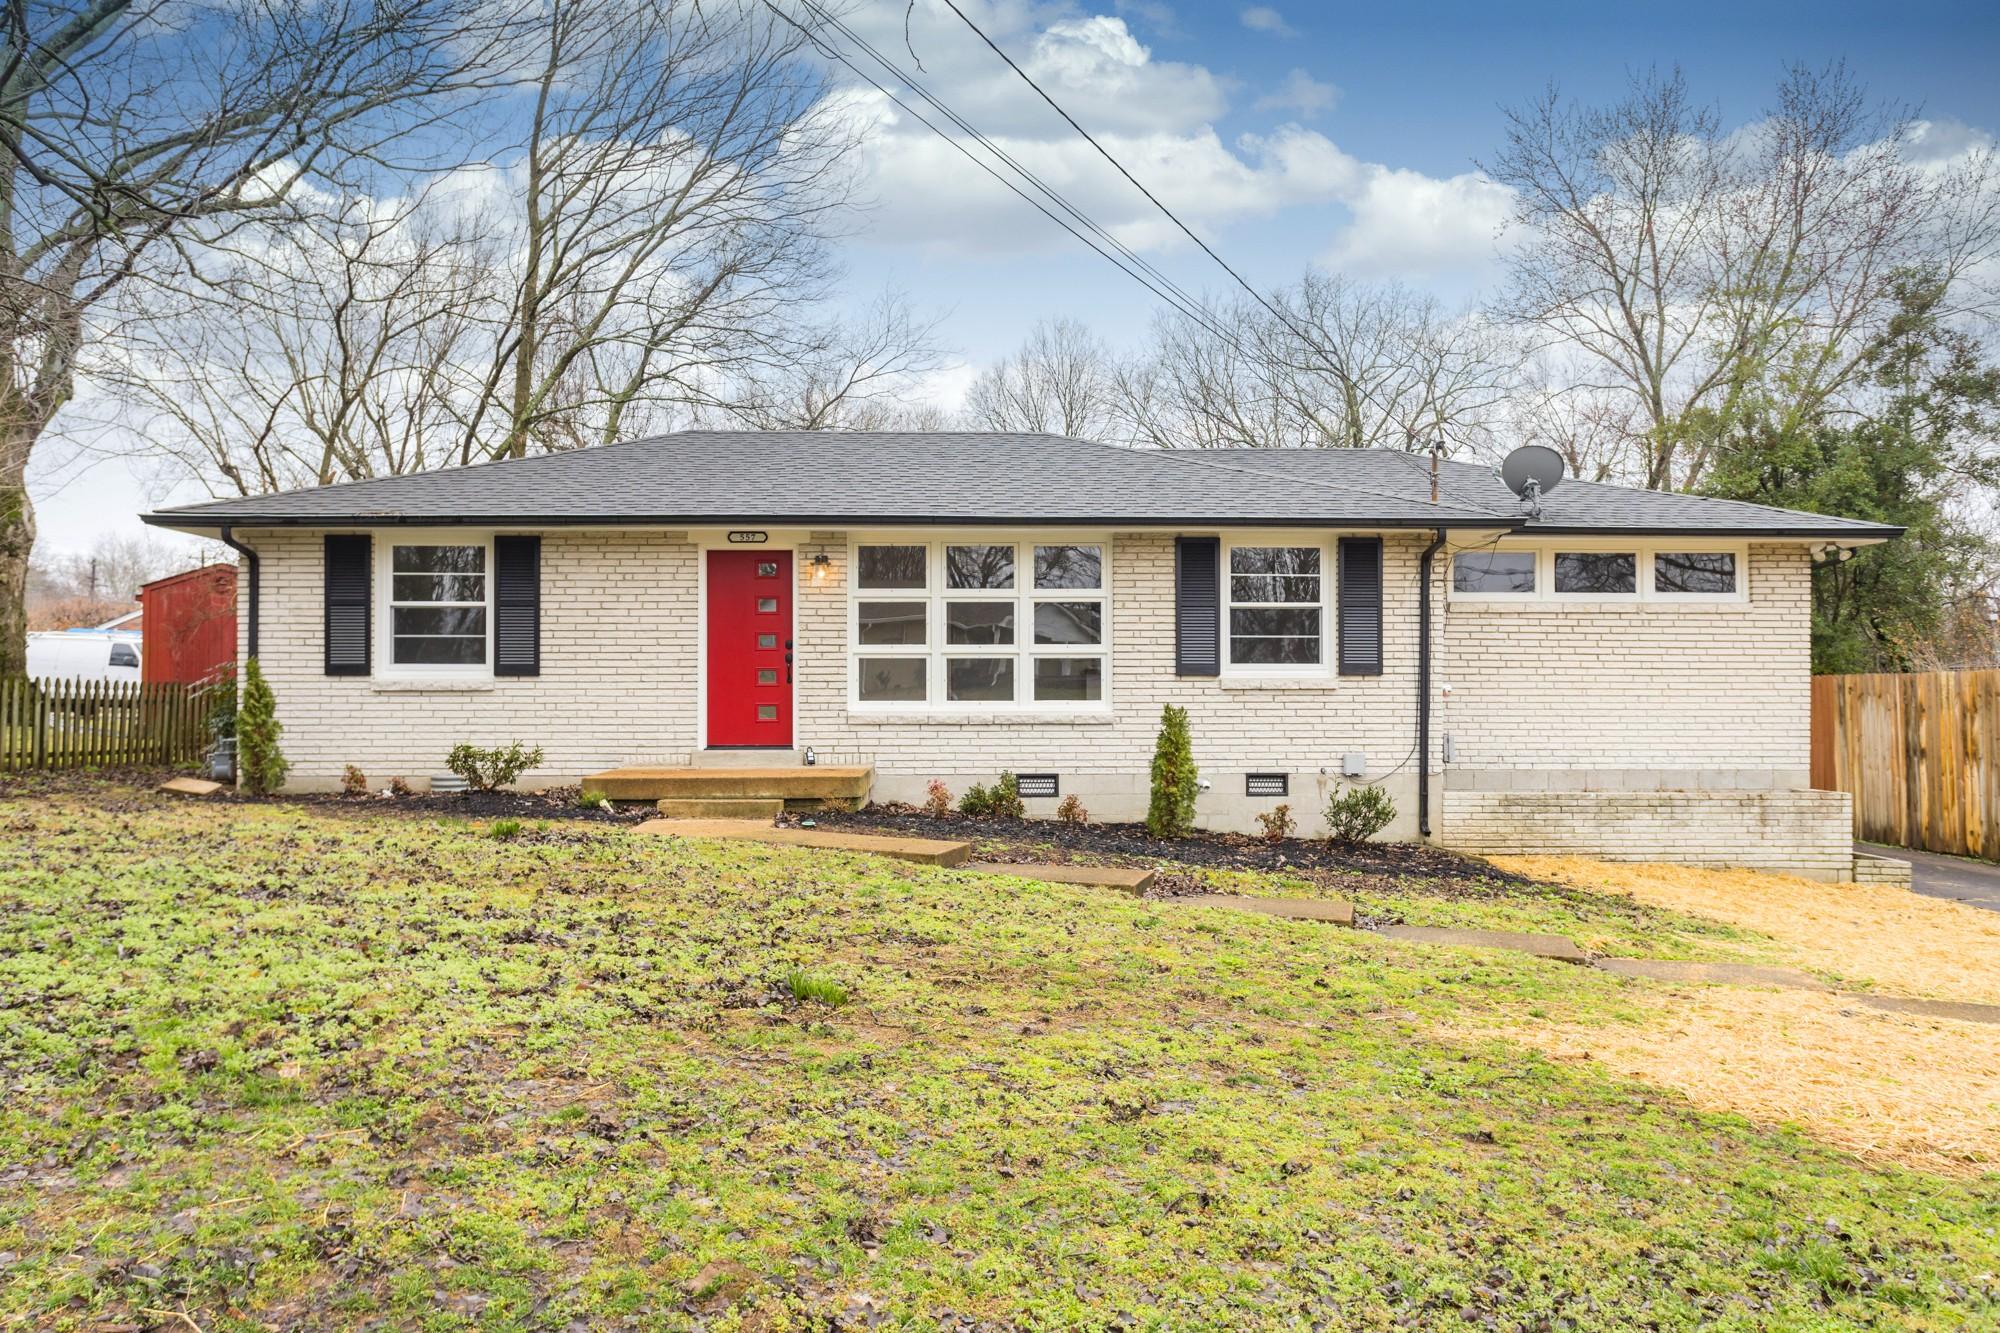 557 Whispering Hills Dr, Nashville, TN 37211 - Nashville, TN real estate listing